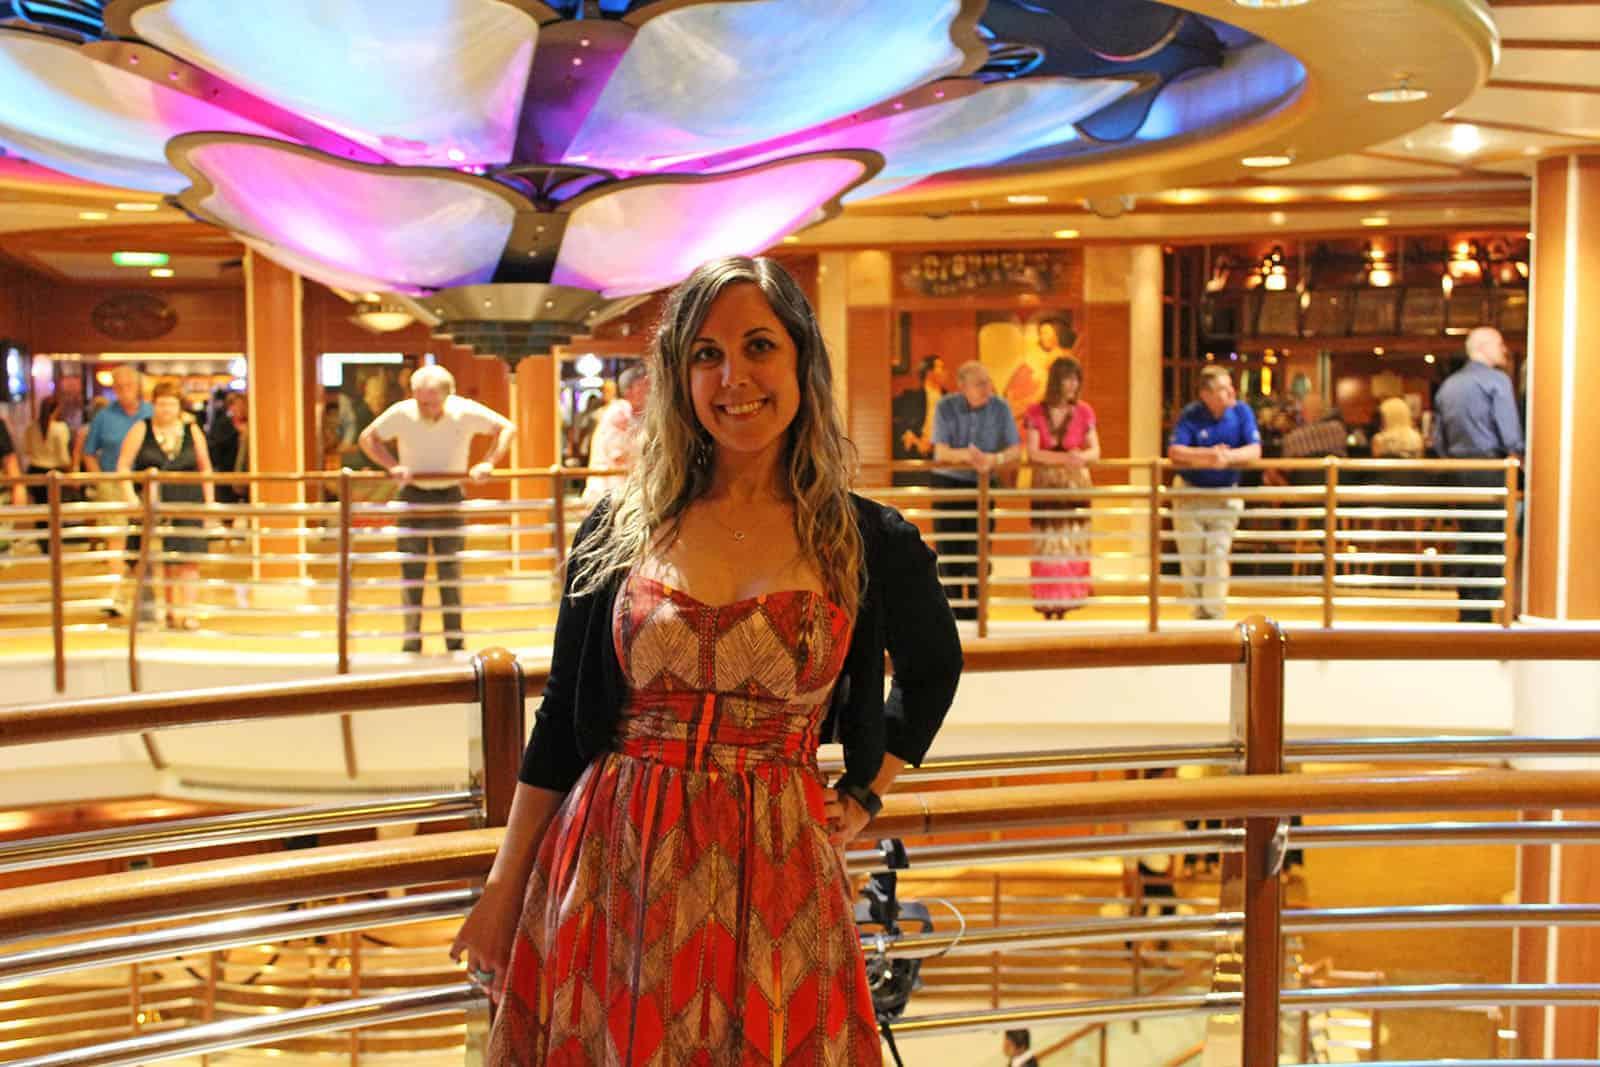 Evening Aboard the Caribbean Princess